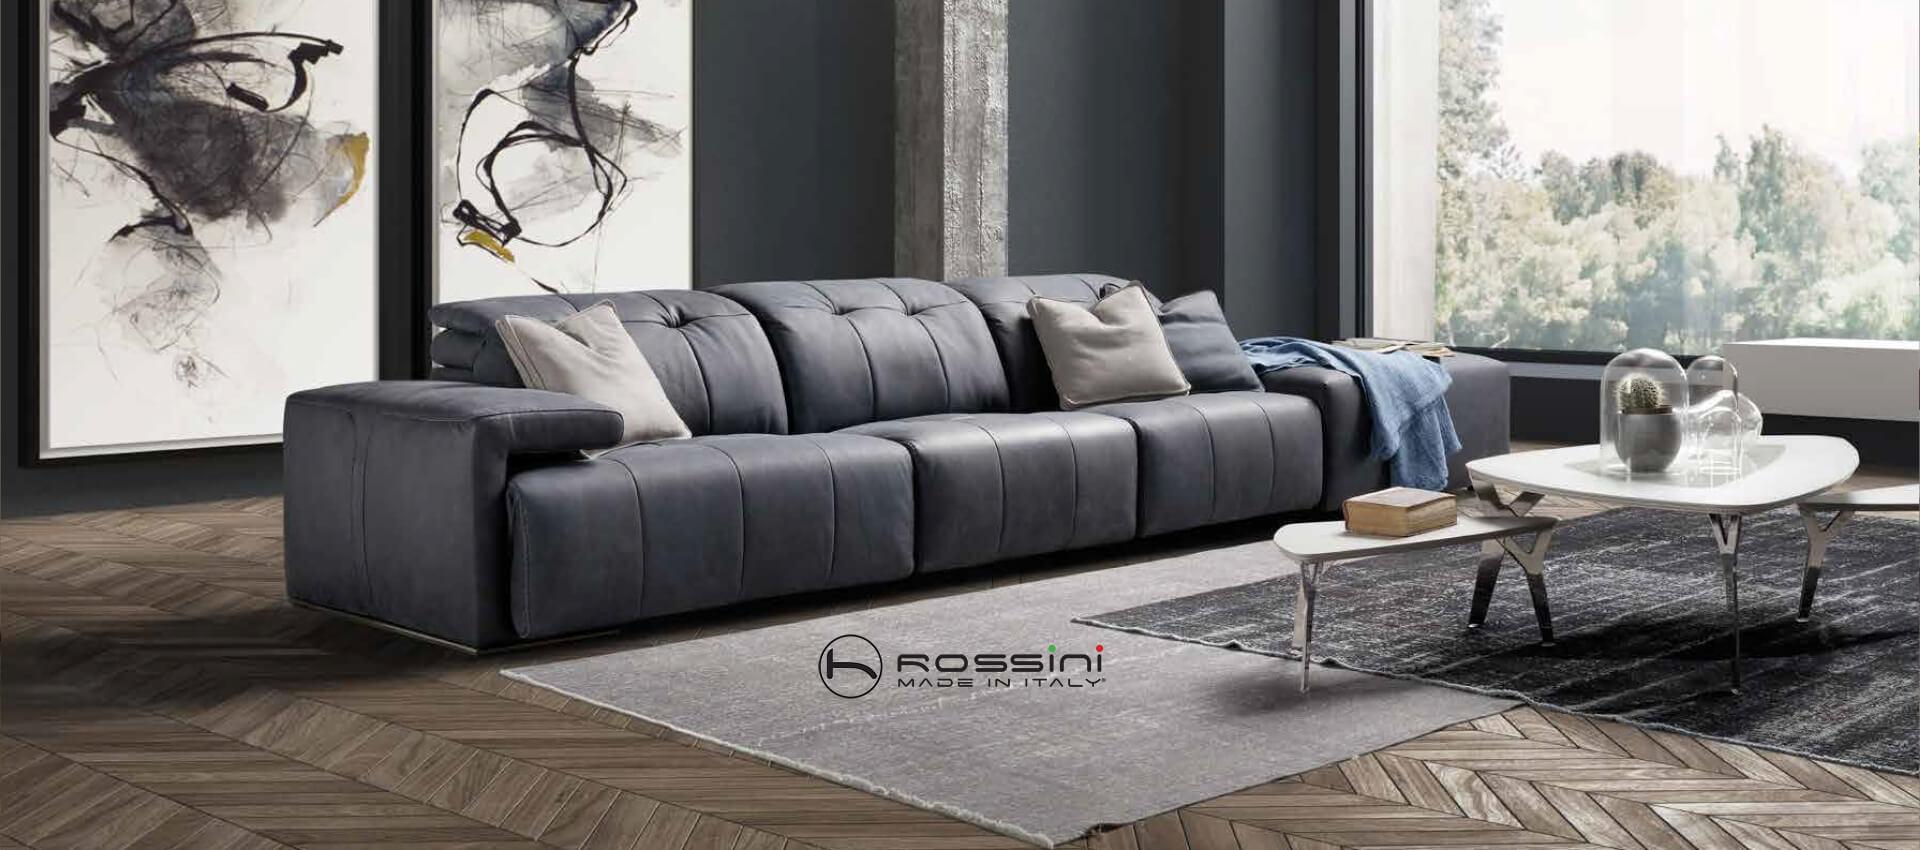 Rossini sofa 義大利進口原裝沙發